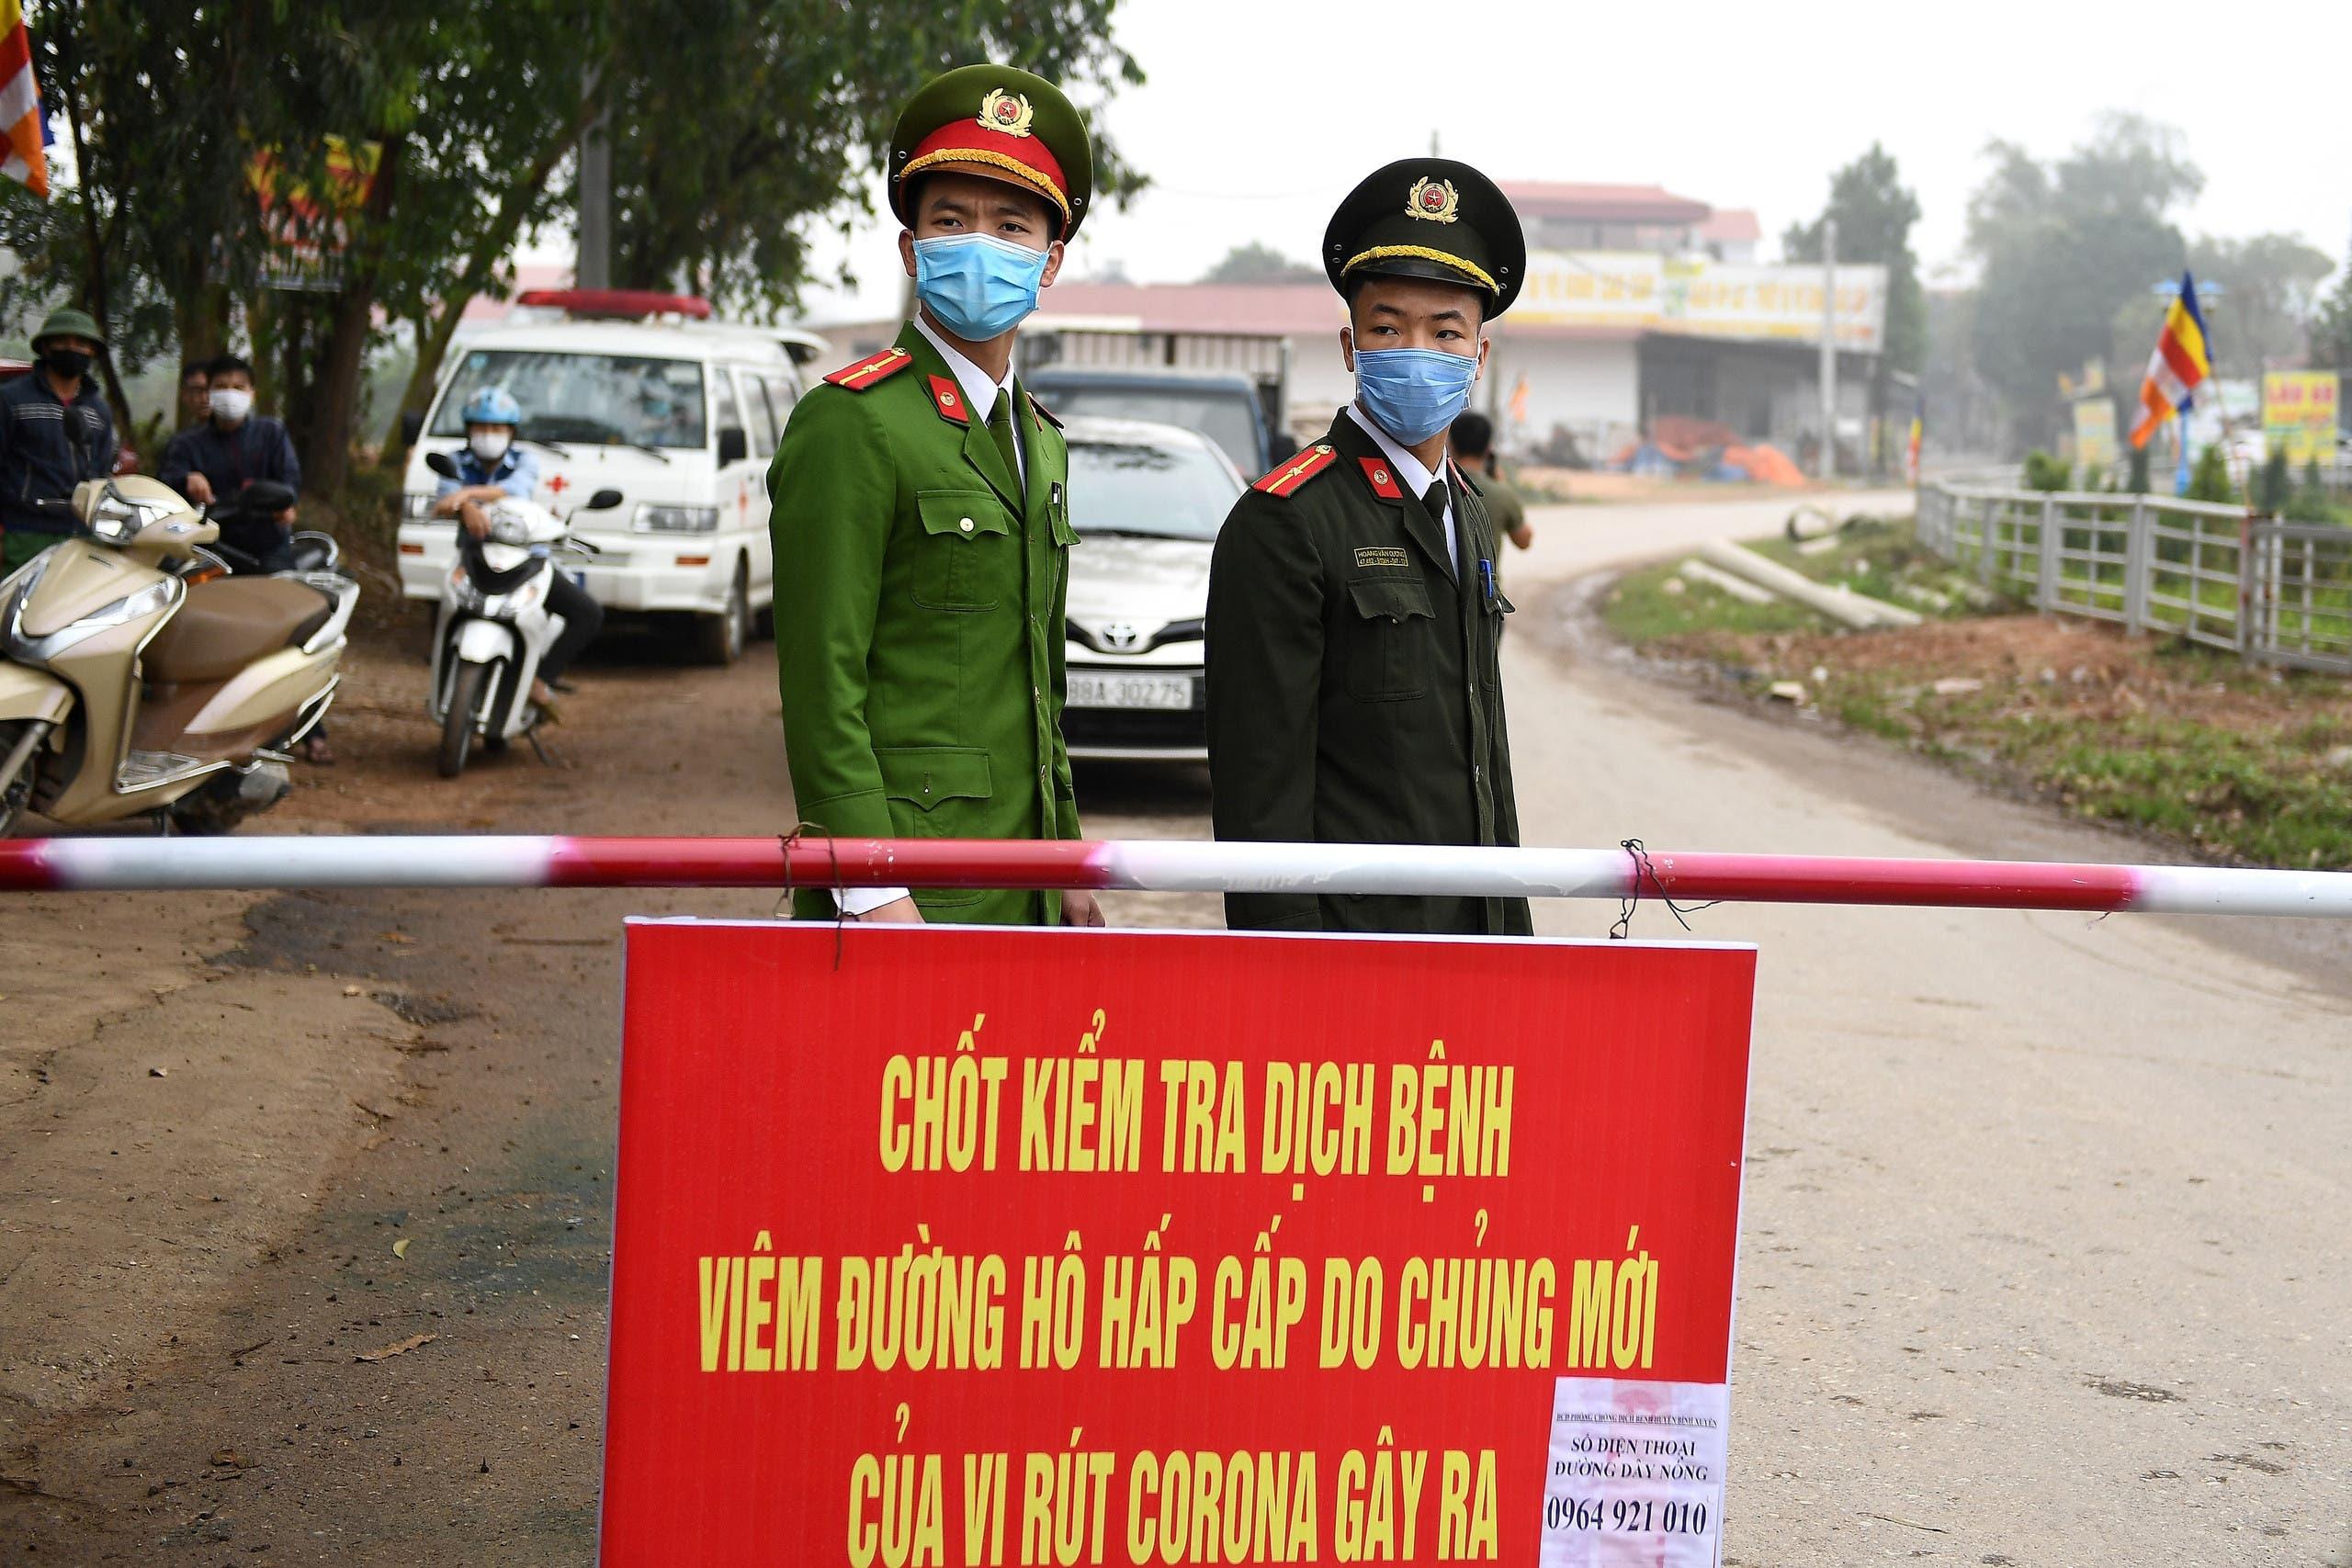 Son Loi Vietnam quarantine coronavirus - Reuters